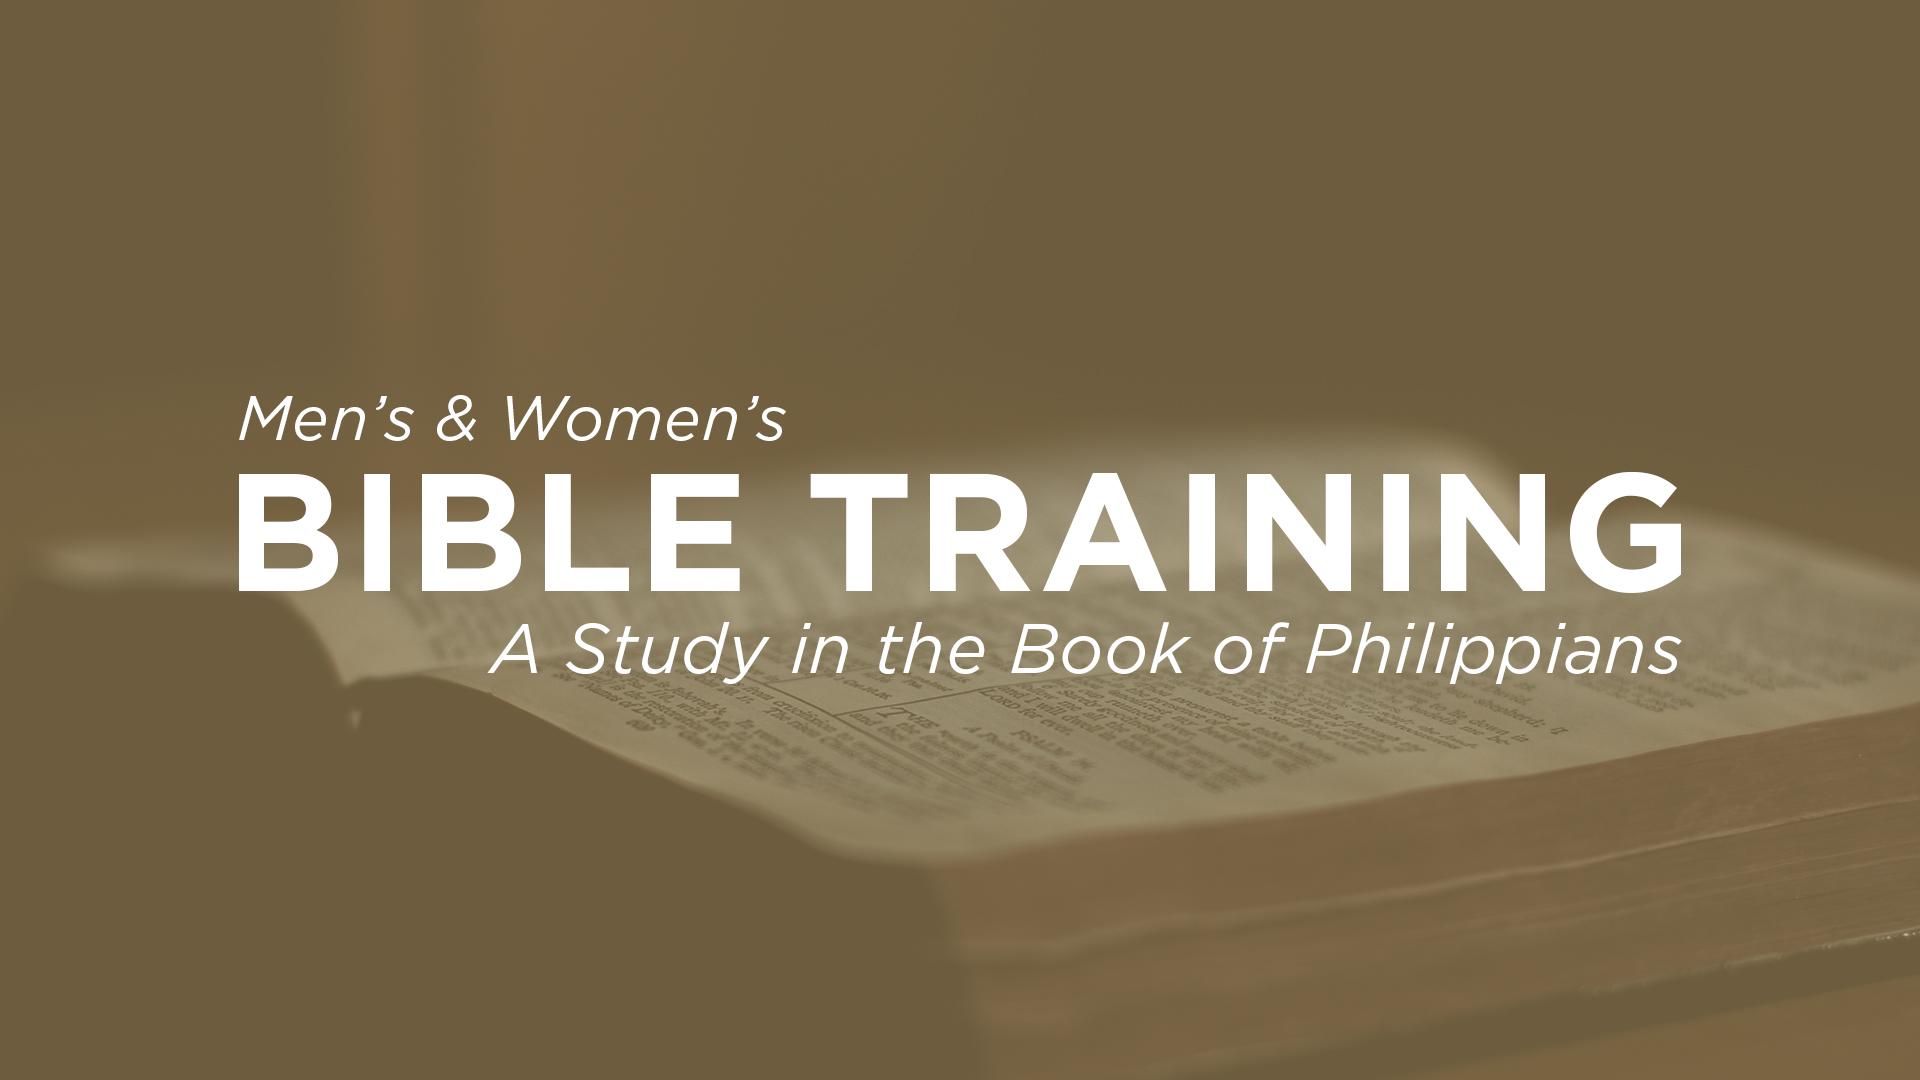 bible training philippians.jpg